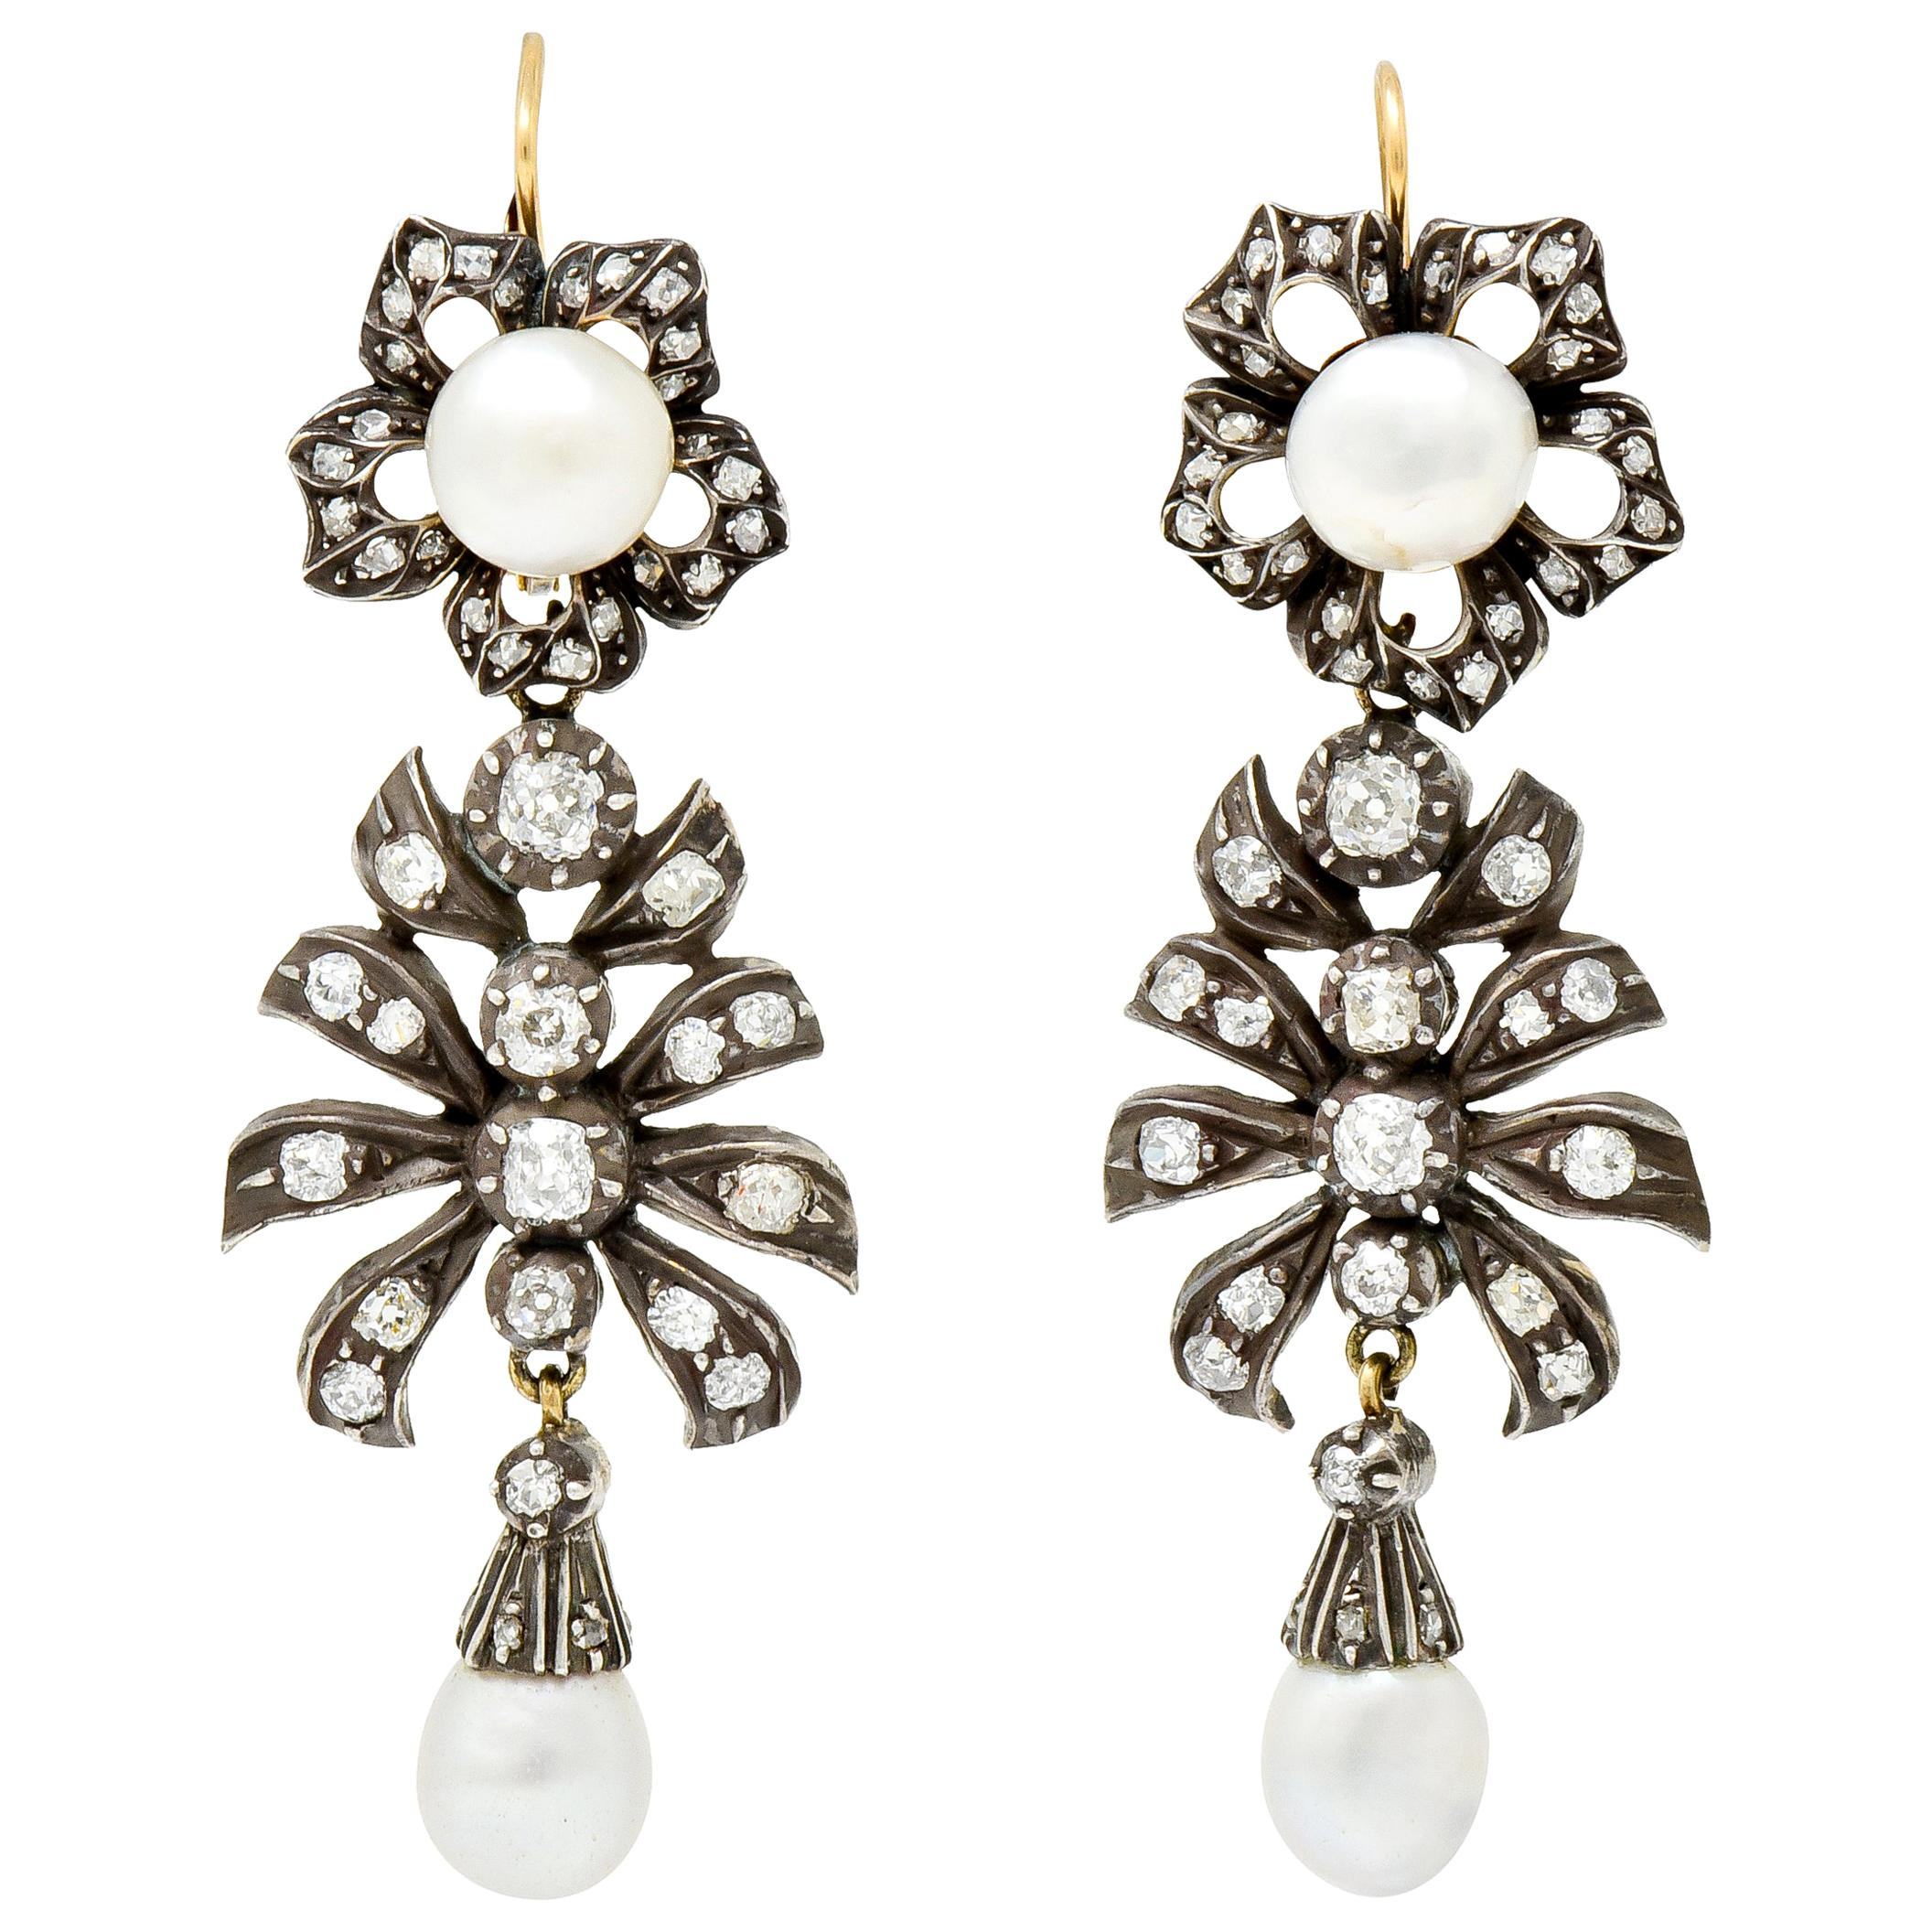 Victorian Diamond Natural Pearl Gold Silver Floral Drop Earrings GIA, circa 1860